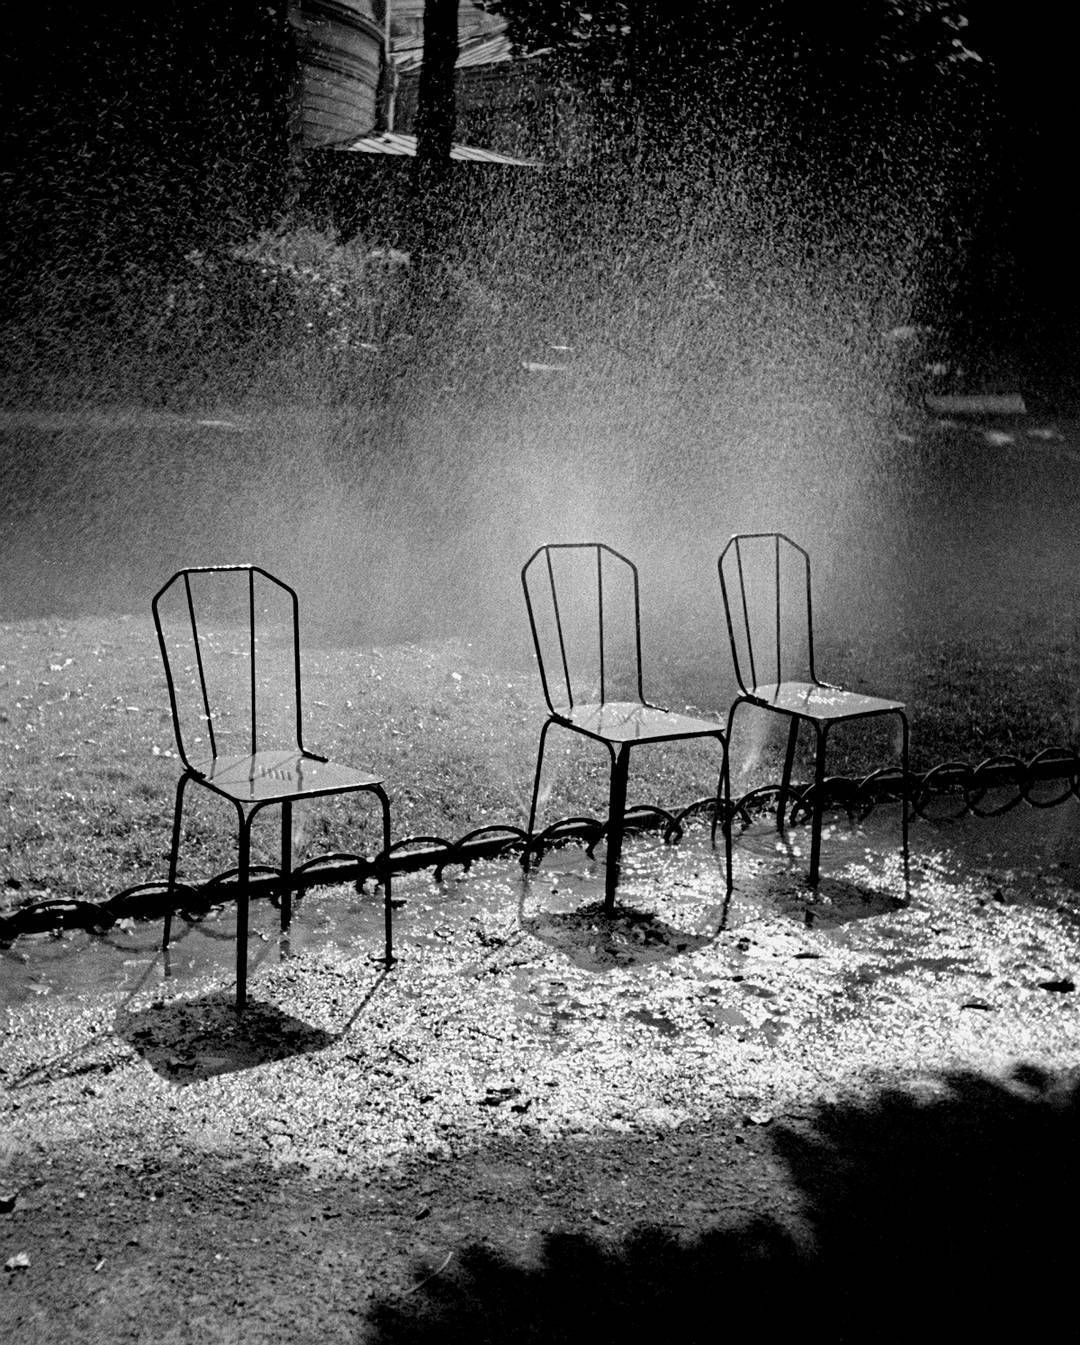 Три стула, 1936, Париж. Фотограф Фред Стайн